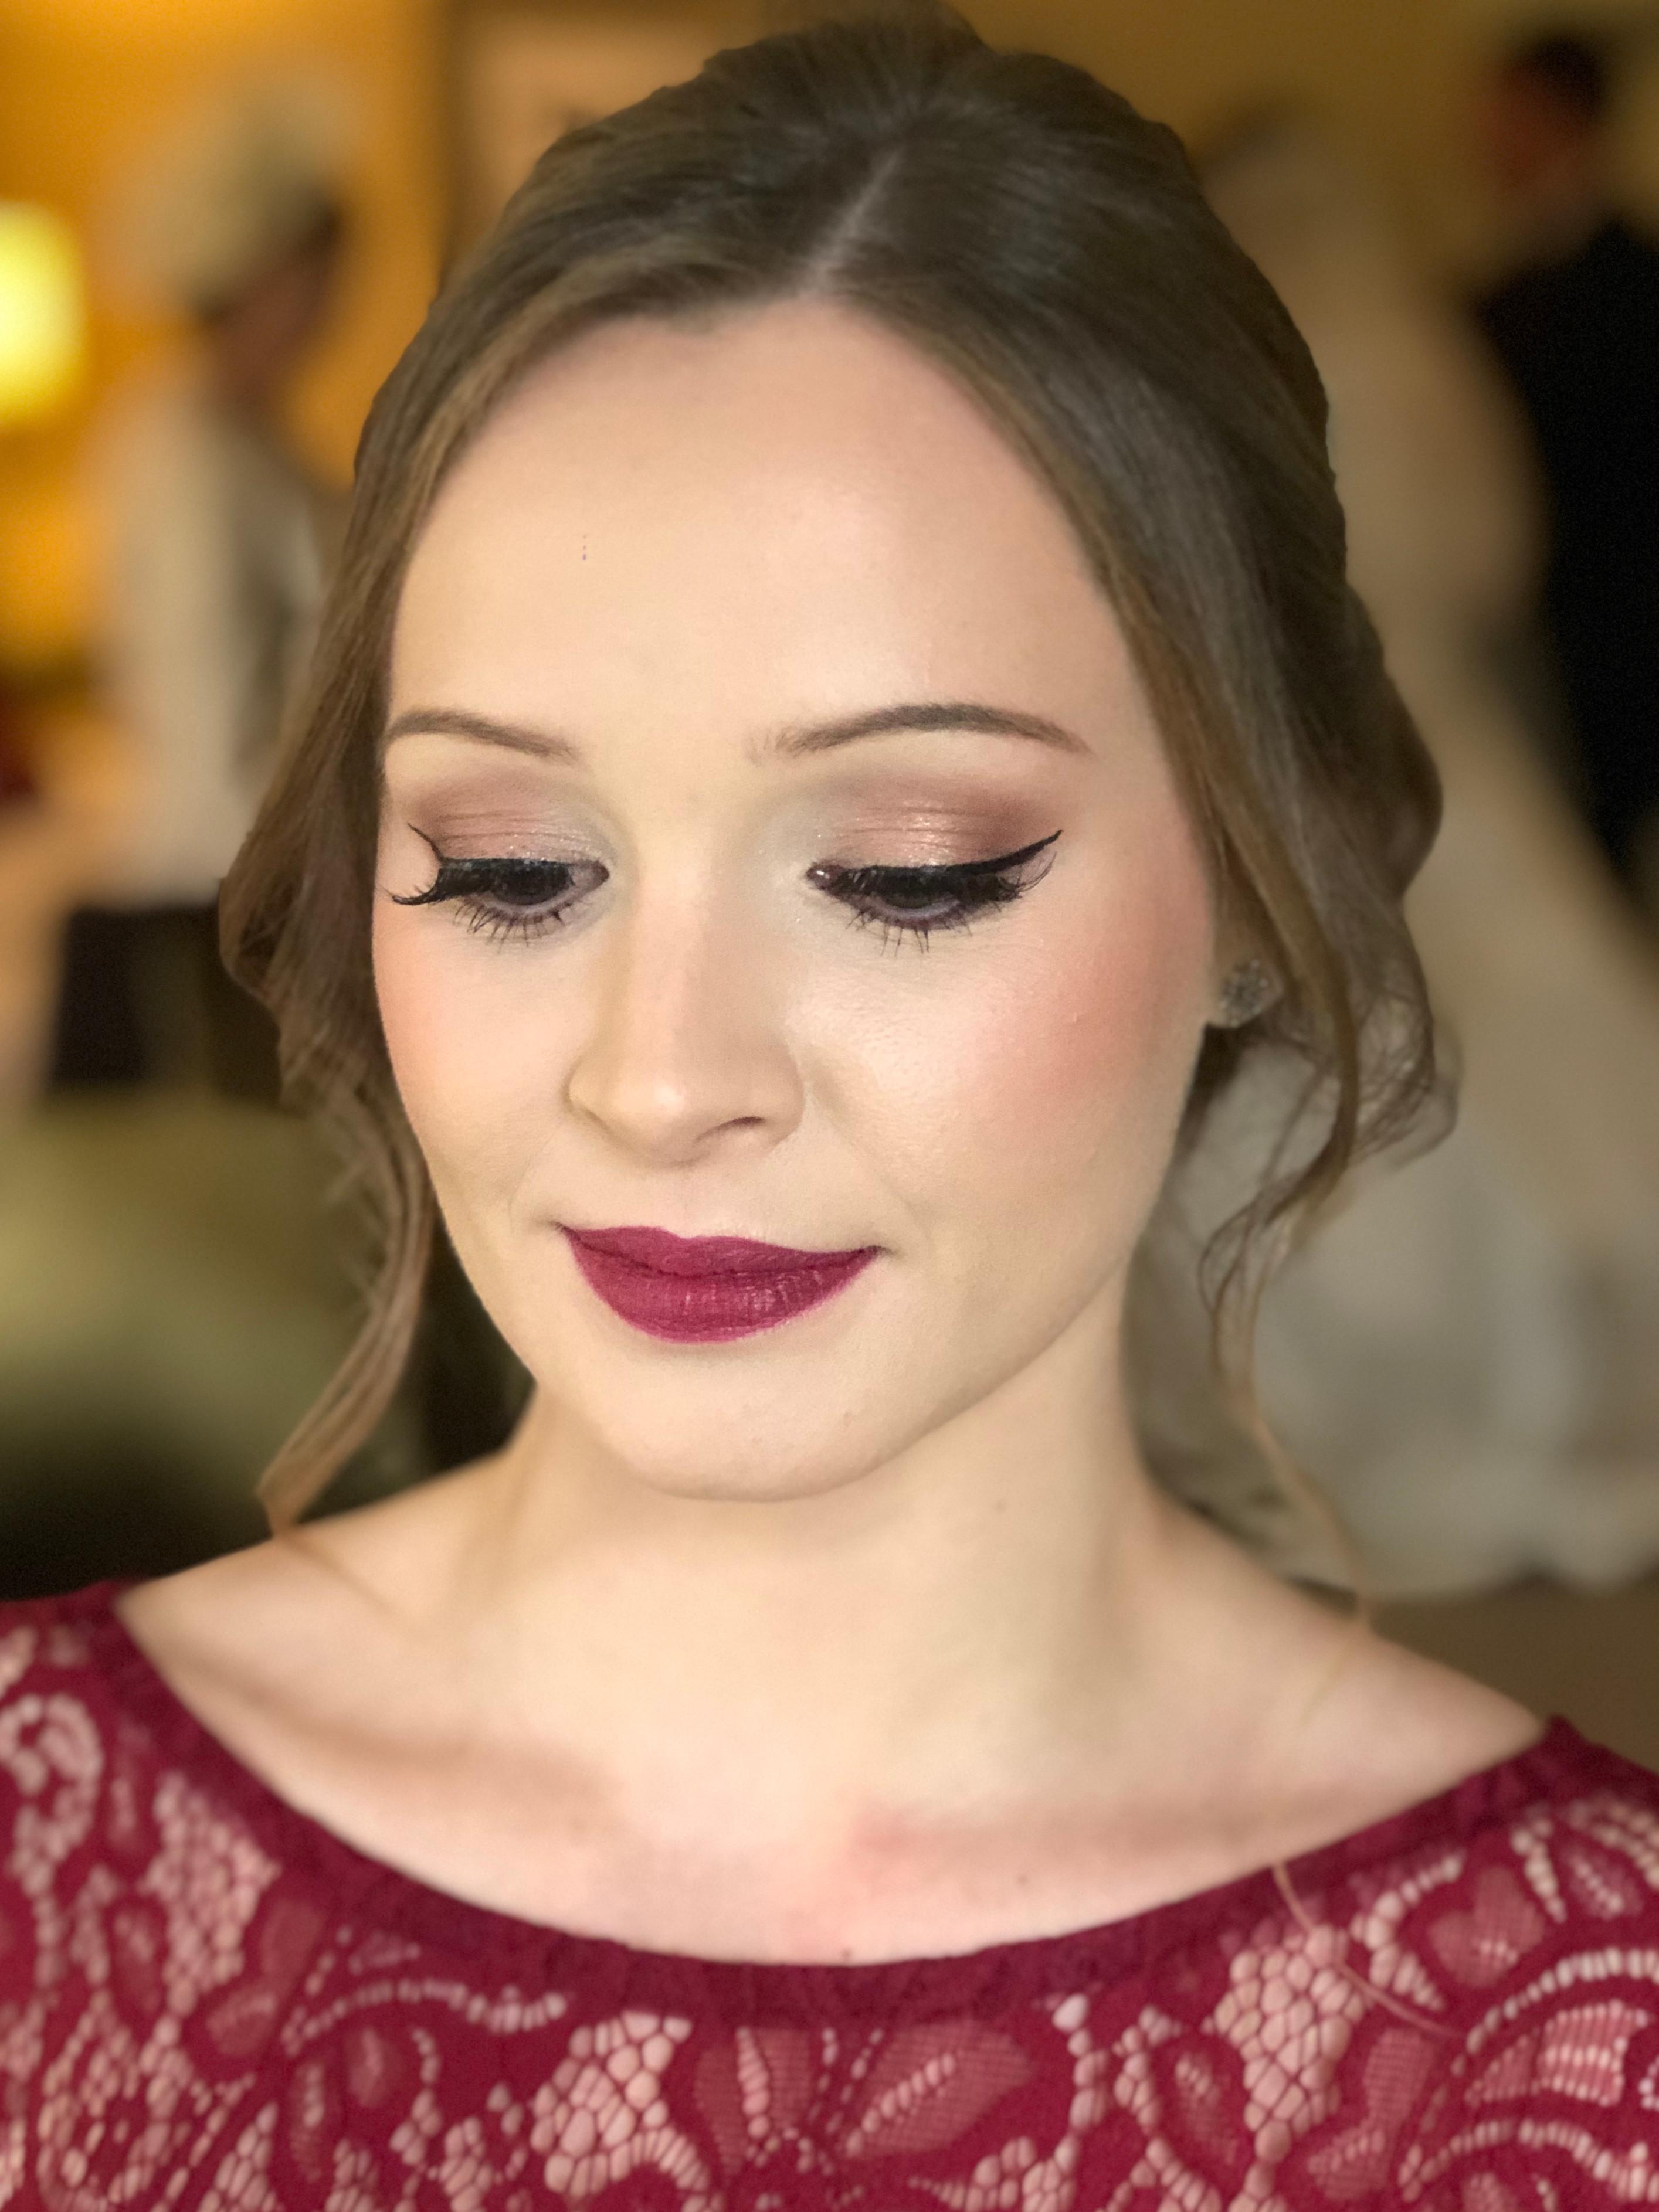 Occasion Makeup Application